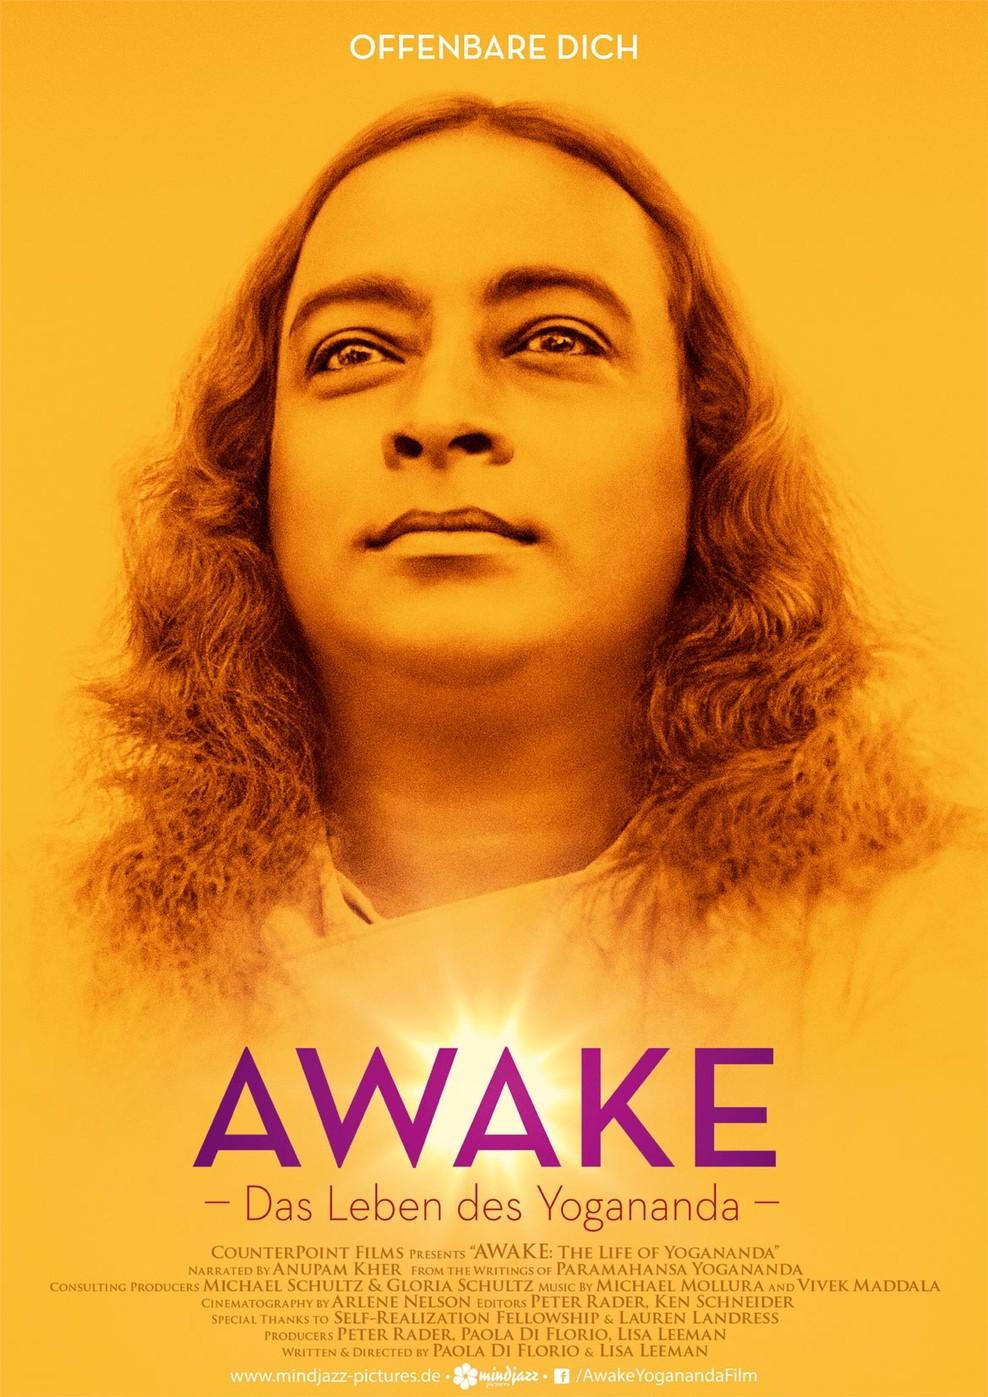 Awake - Das Leben des Yogananda (Poster)